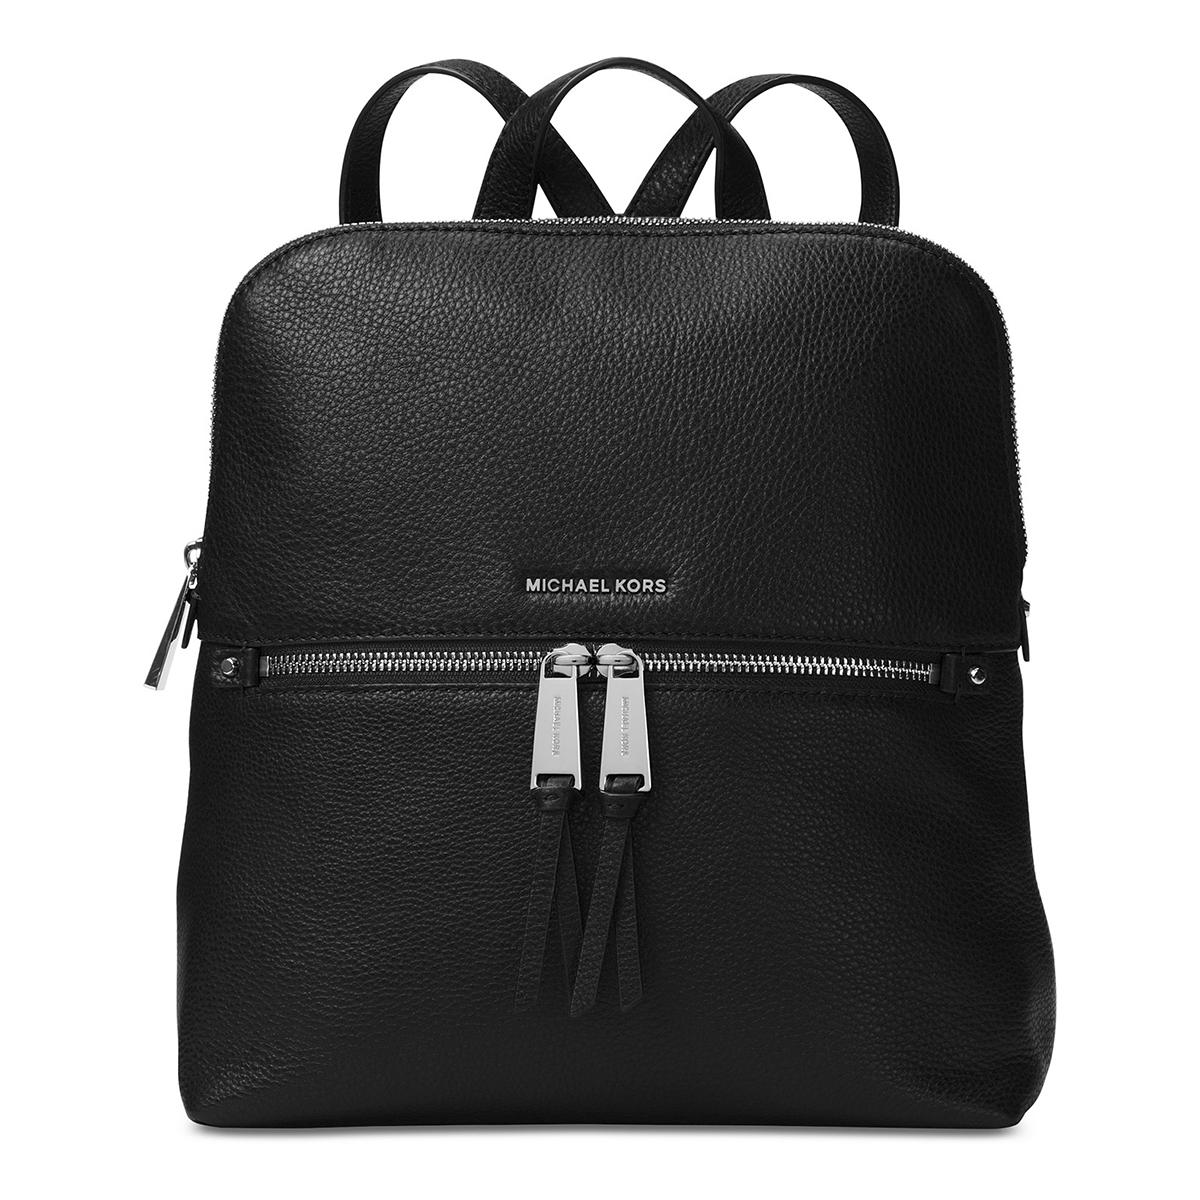 Michael Kors Backpack Silver Hardware